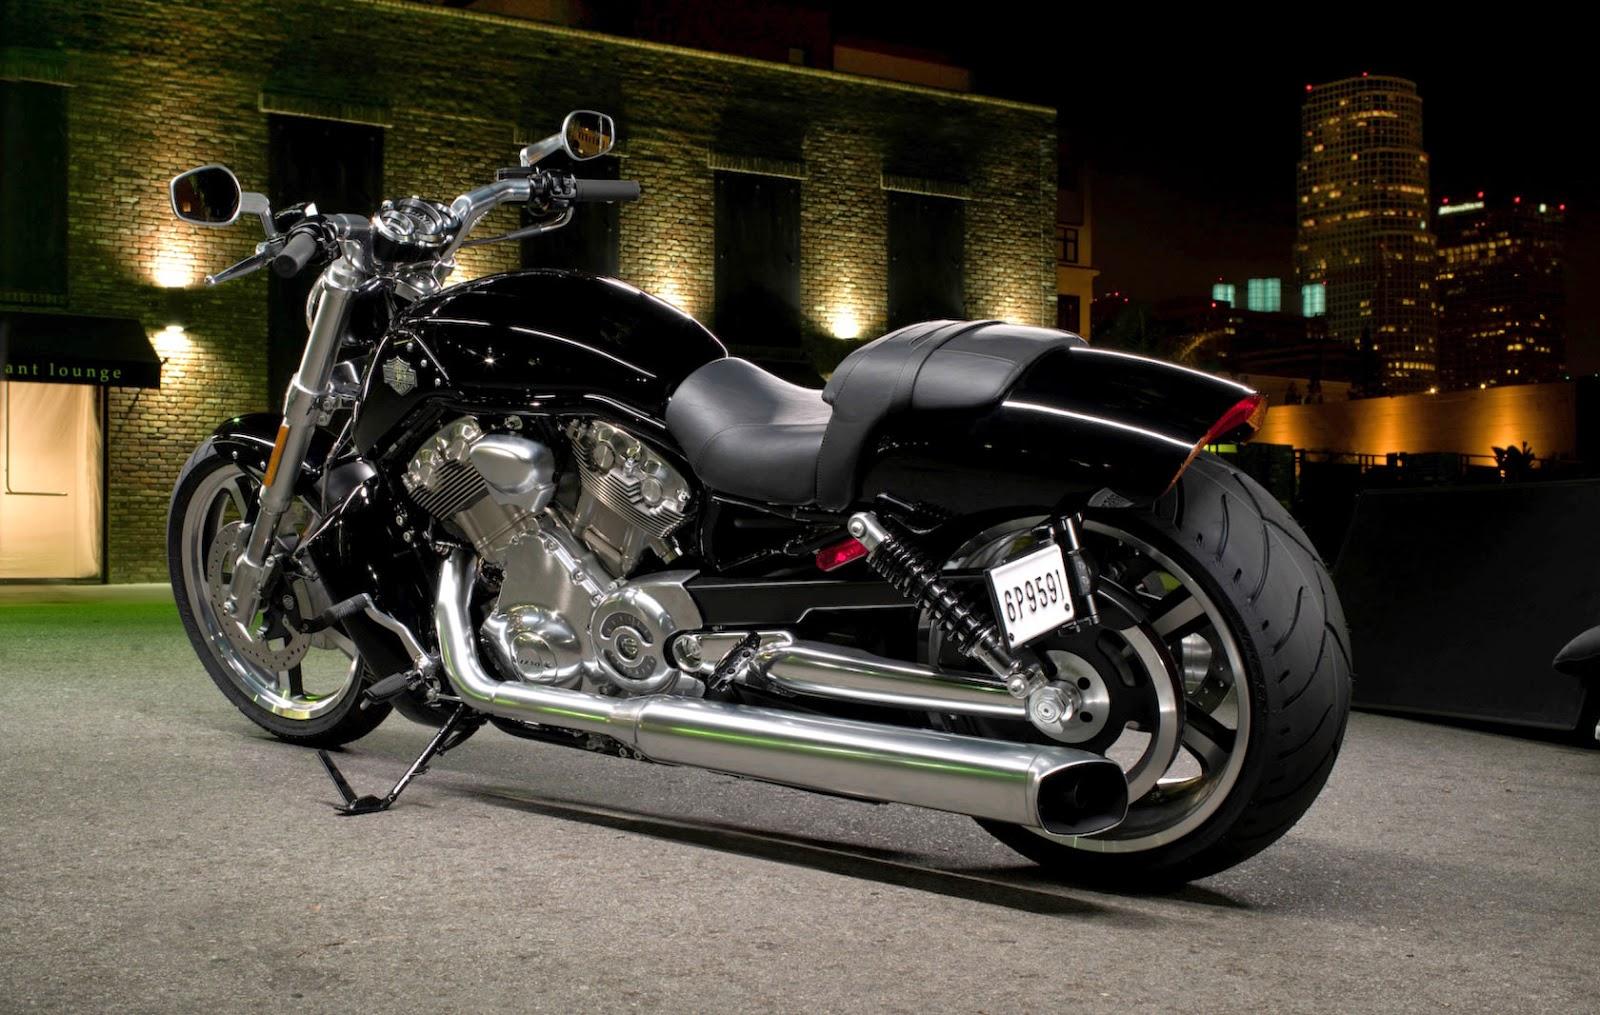 Harley davidson Touring 2009 service Manual on